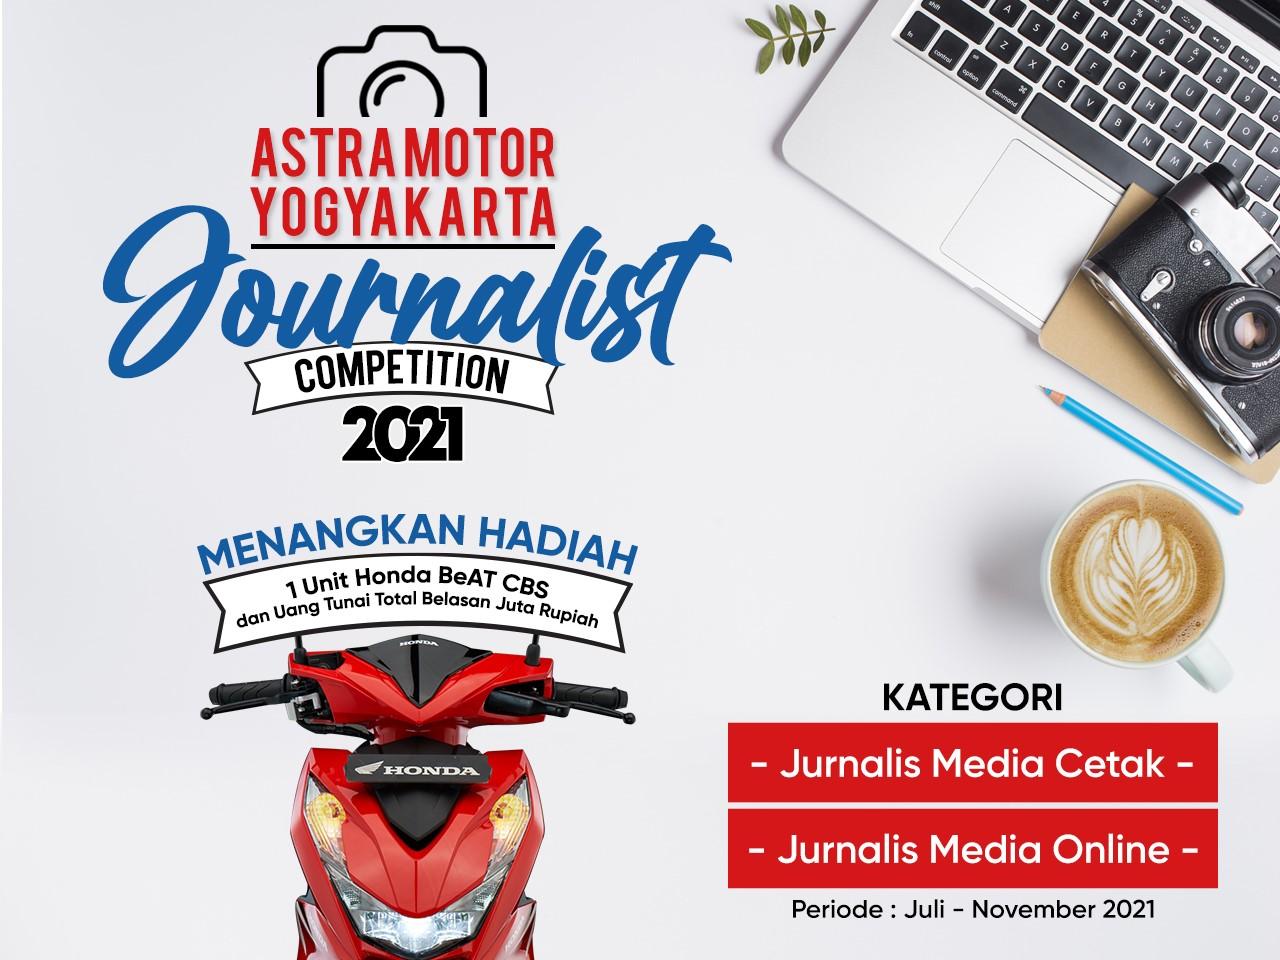 Registrasi Astra Motor Yogyakarta Journalist Competition 2021